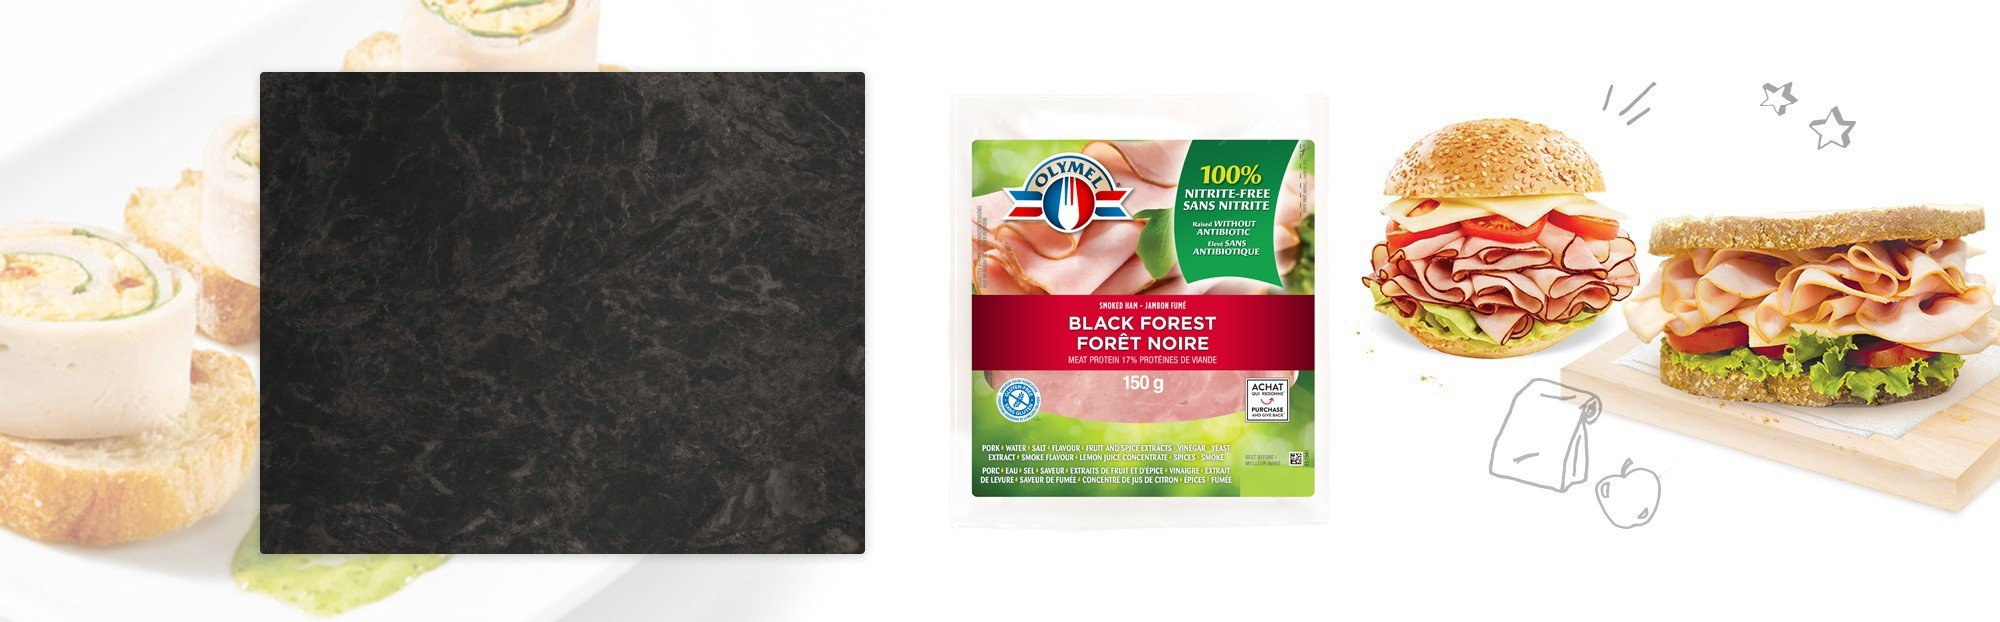 Sliced Black Forest Smoked Ham, nitrite-free